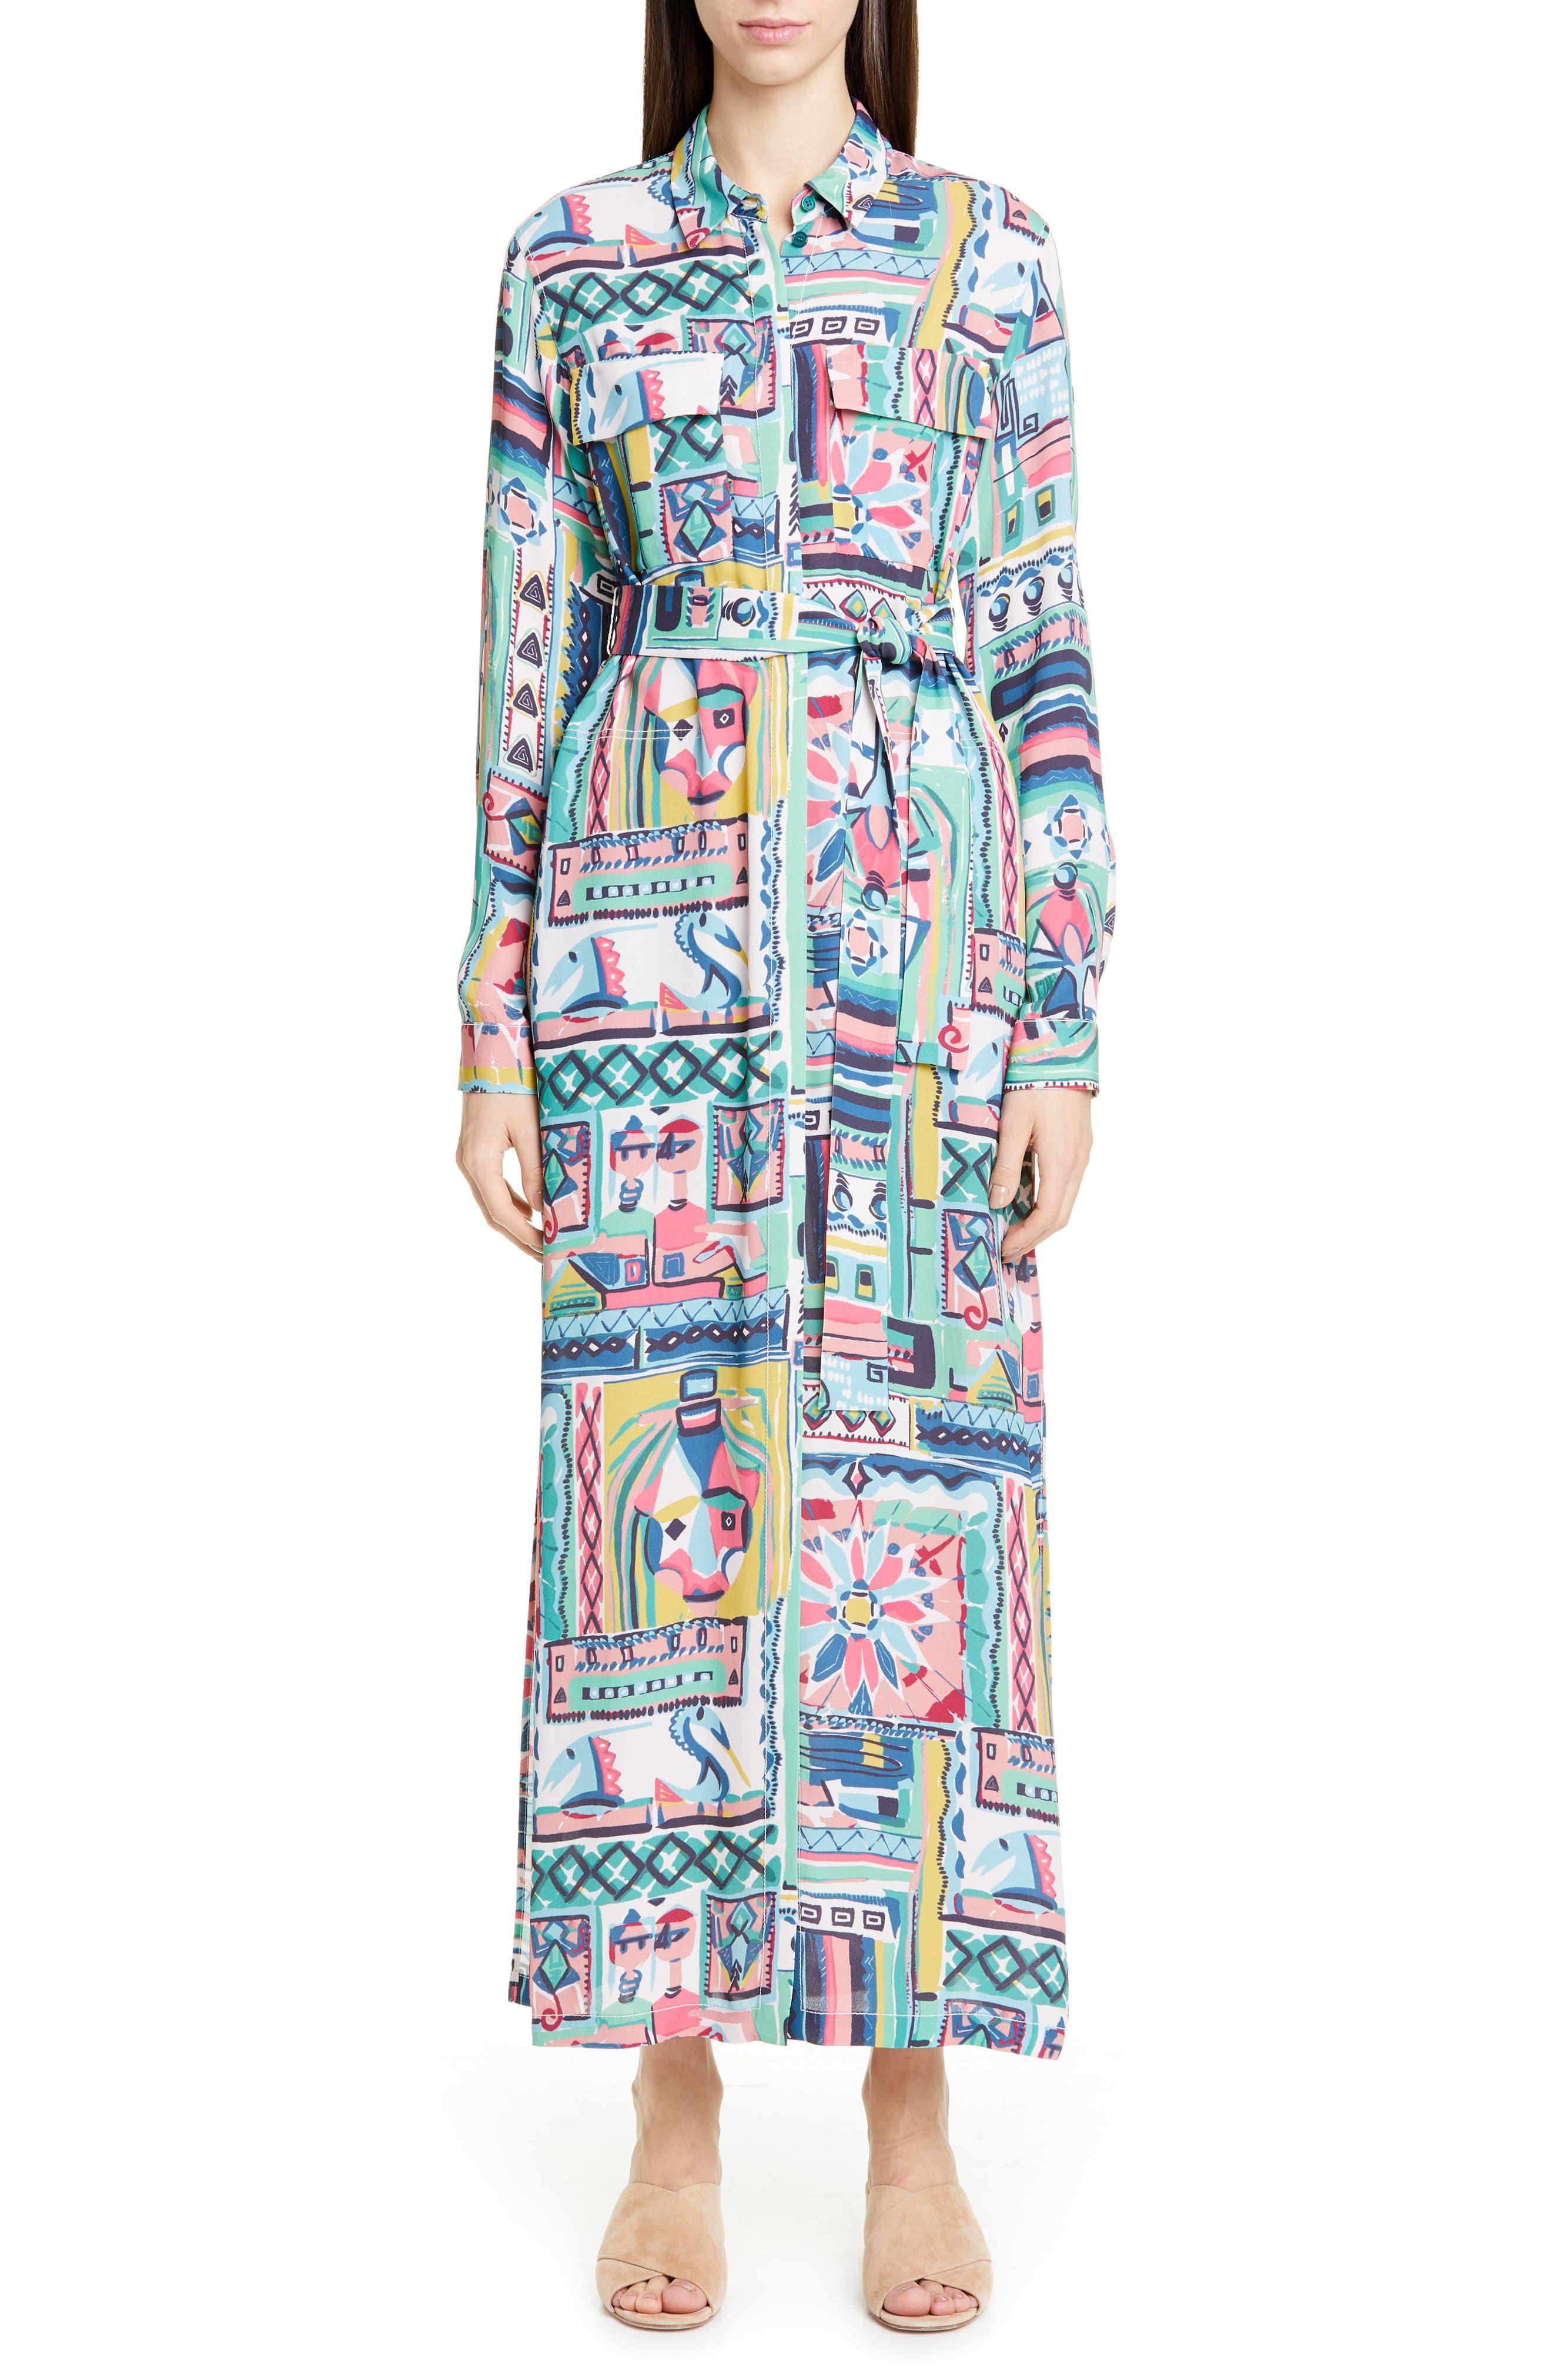 LAFAYETTE 148 NEW YORK Doha Palazzo Patchwork Print Maxi Shirtdress, Main, color, 400